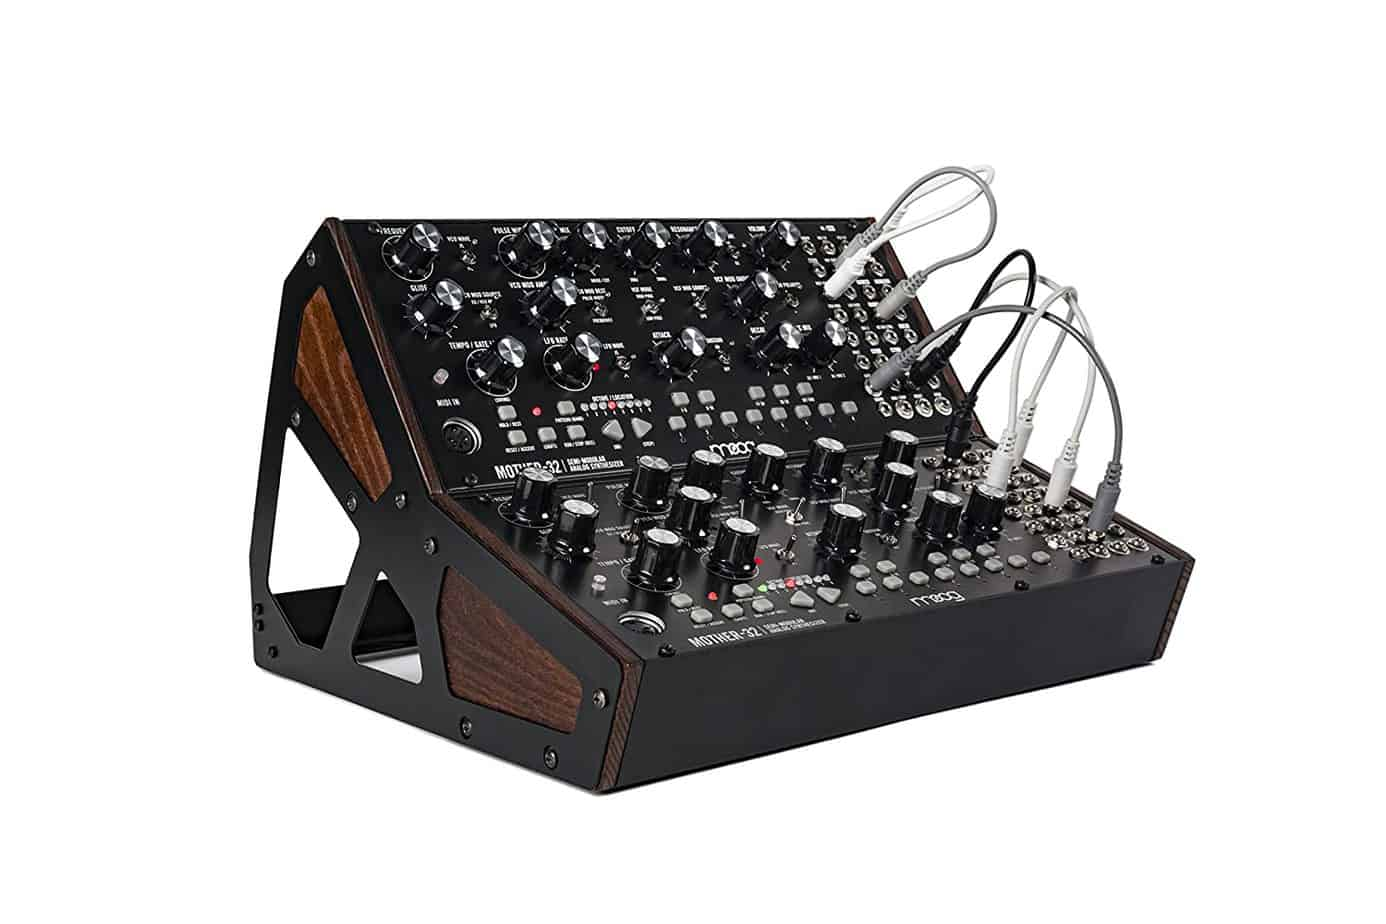 Best modular synth – Moog mother 32 semi-modular synthesizer